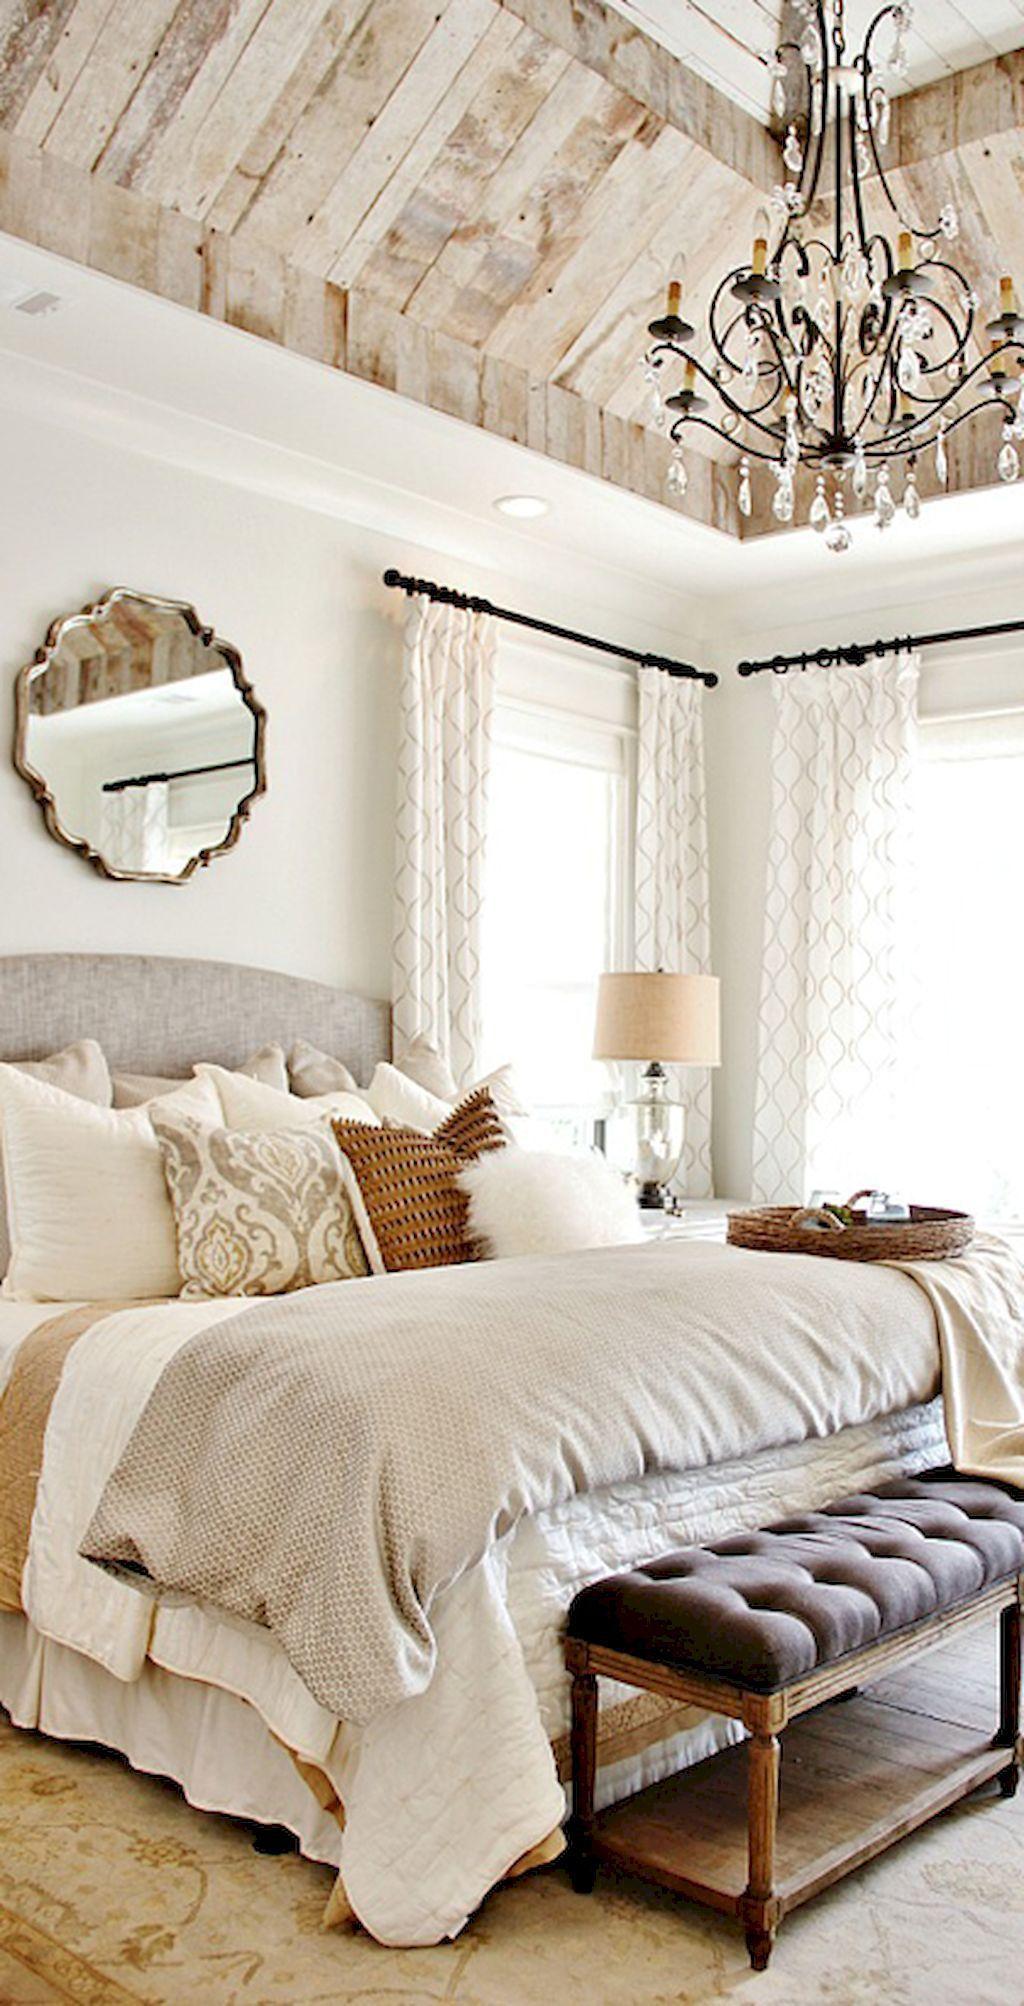 romantic farmhouse master bedroom ideas 14 farmhouse on romantic trend master bedroom ideas id=69735